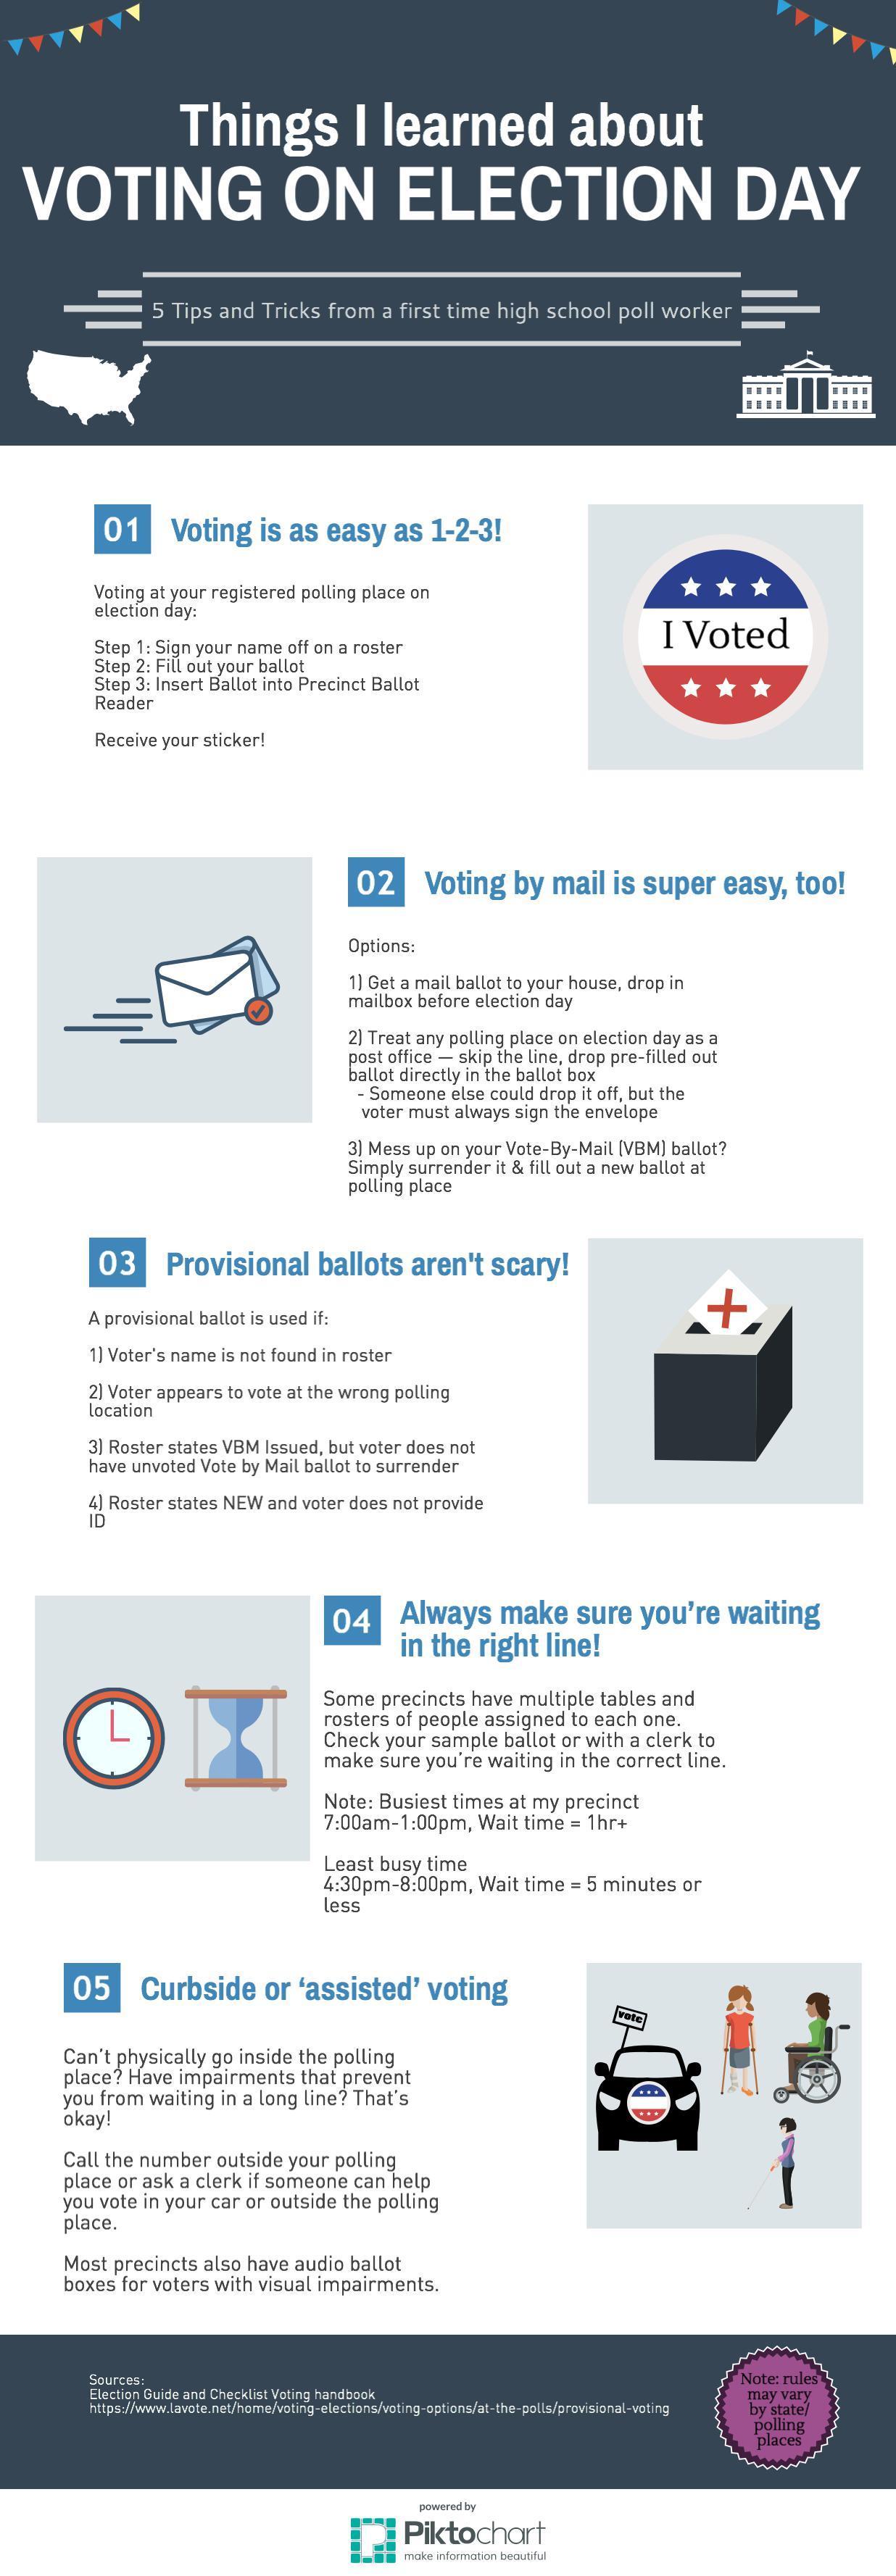 voting-tips_18148443_034ea0ba2c03a4d56bfceaa250f00b930b222ea2